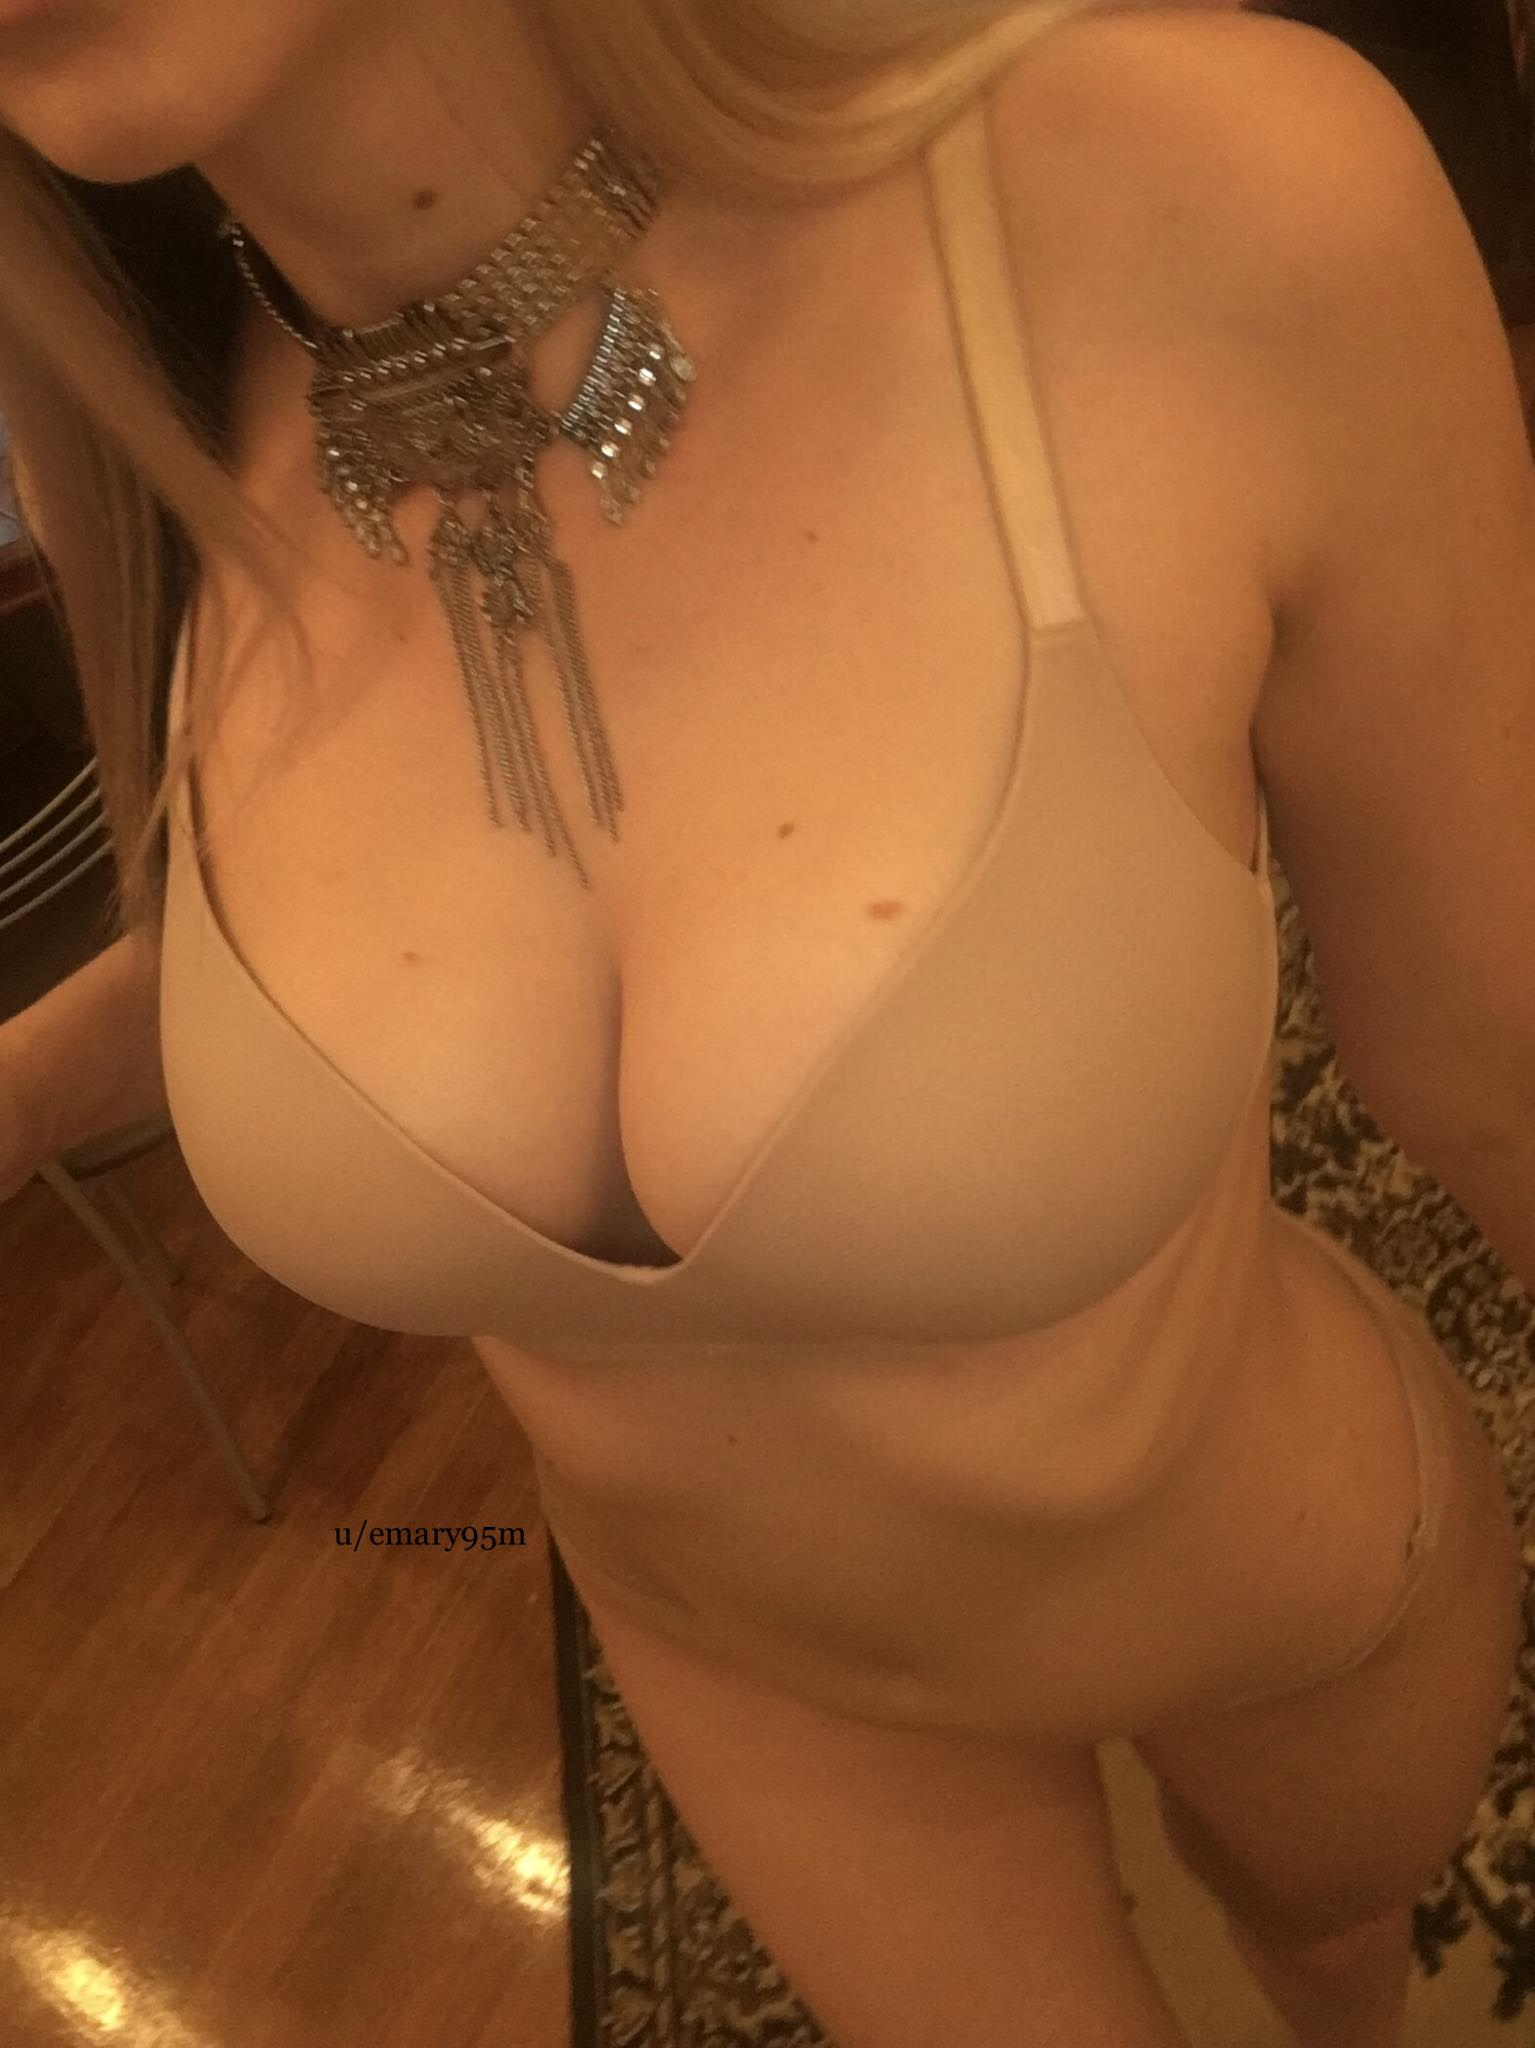 Andie Macdowell Nude In Love After Love f] love my nude bra porn pic - eporner